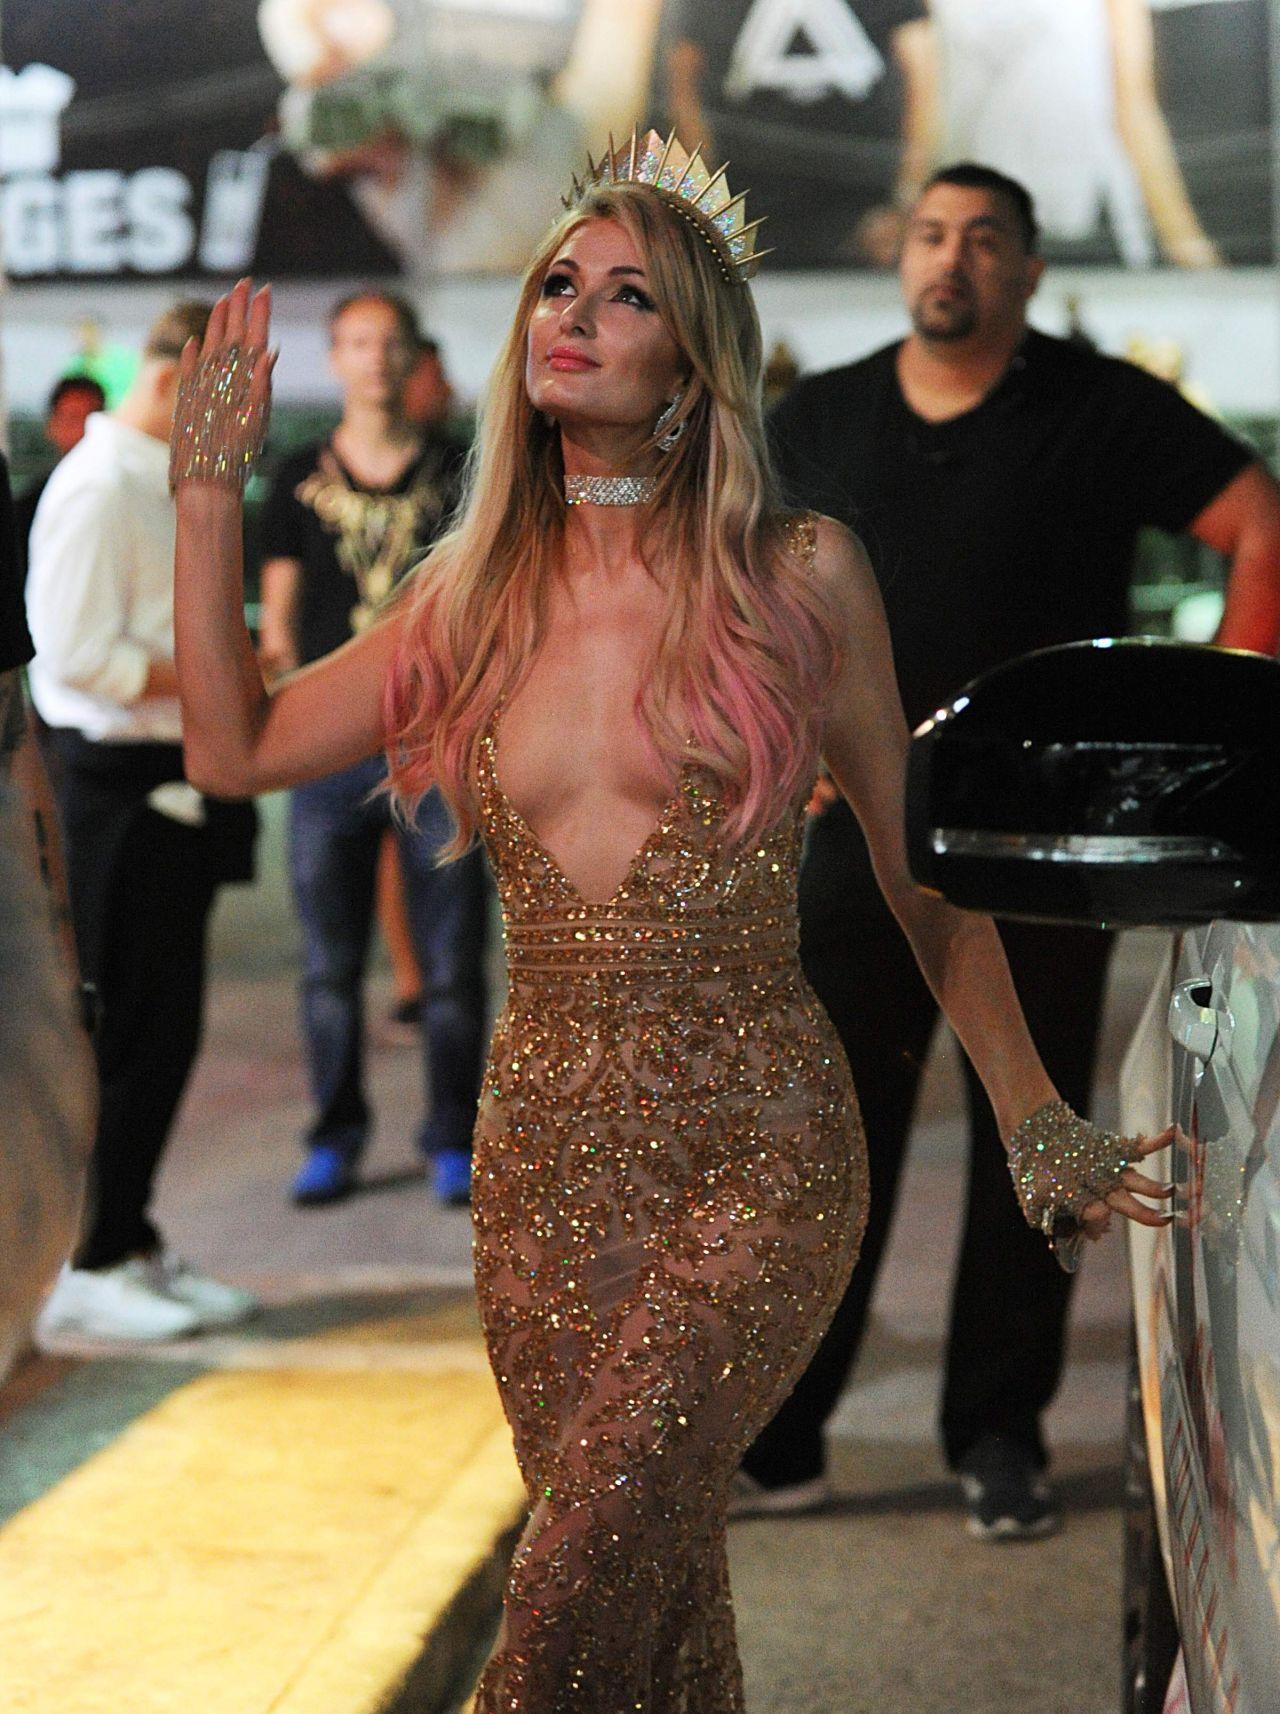 Paris Hilton Party In Ibiza 07 02 2017